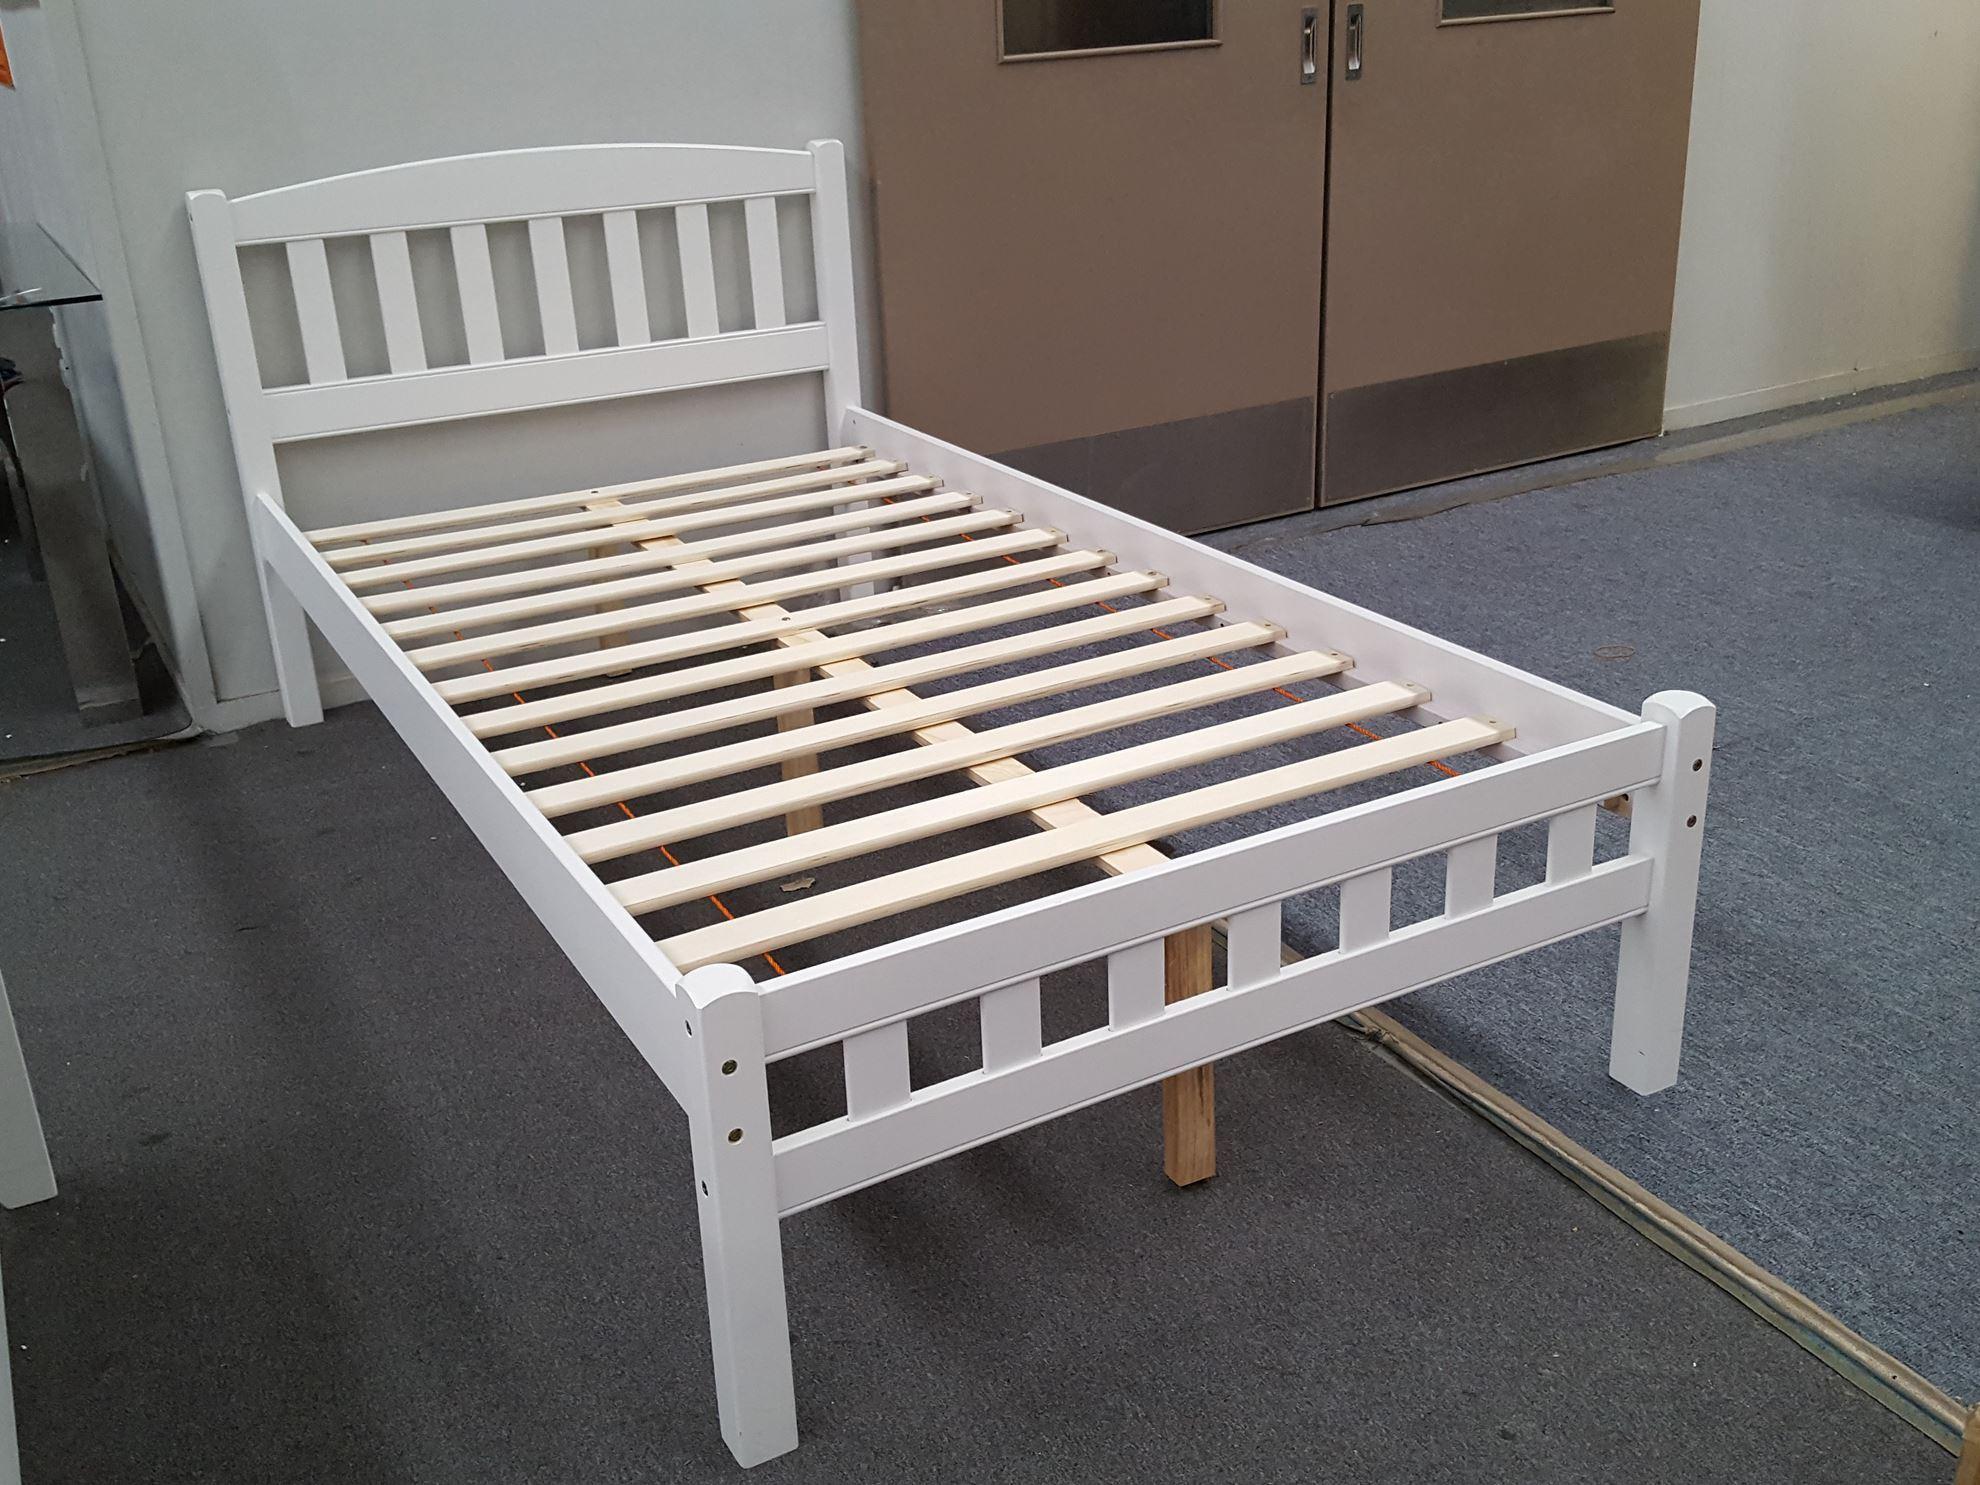 Furniture Place Zara King Single Bed in White